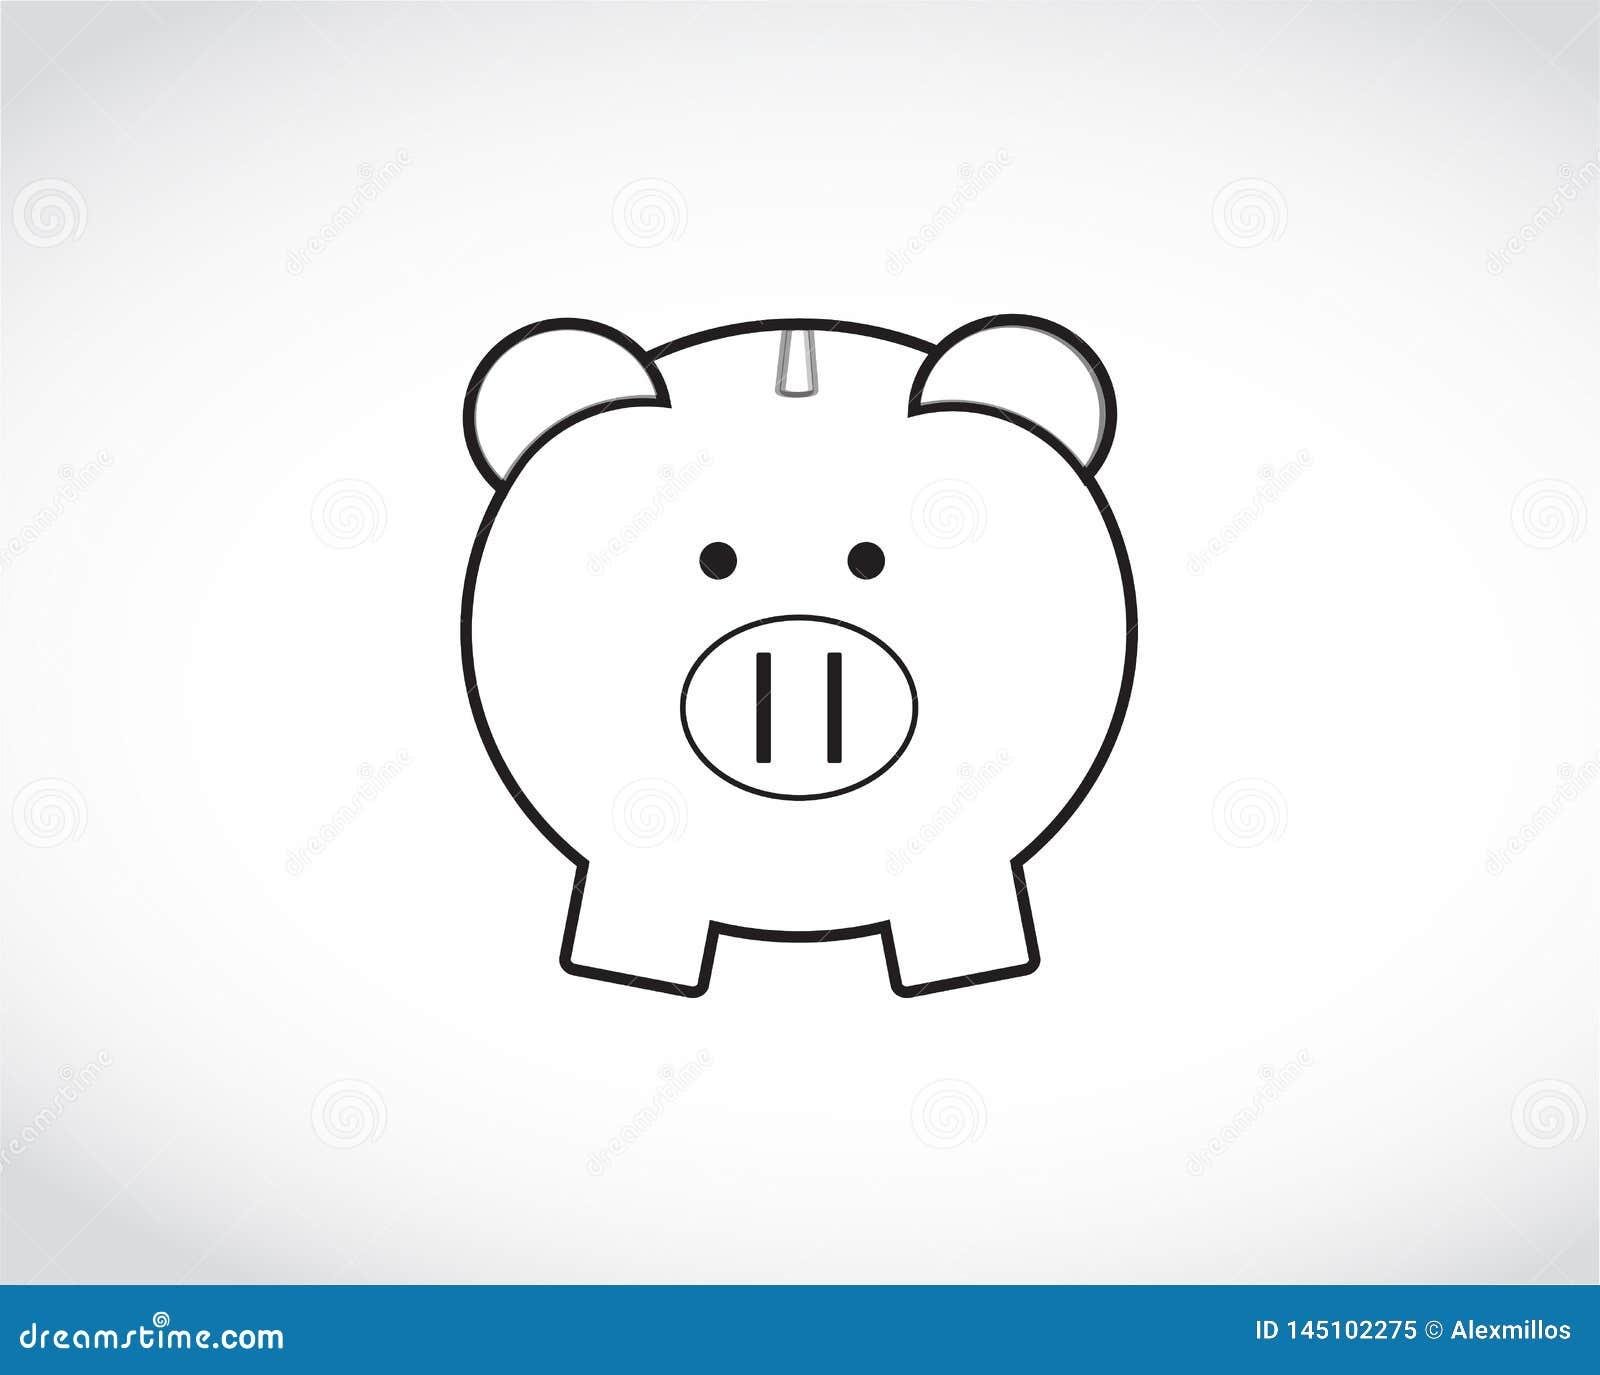 Piggy Bank drawing. Illustration